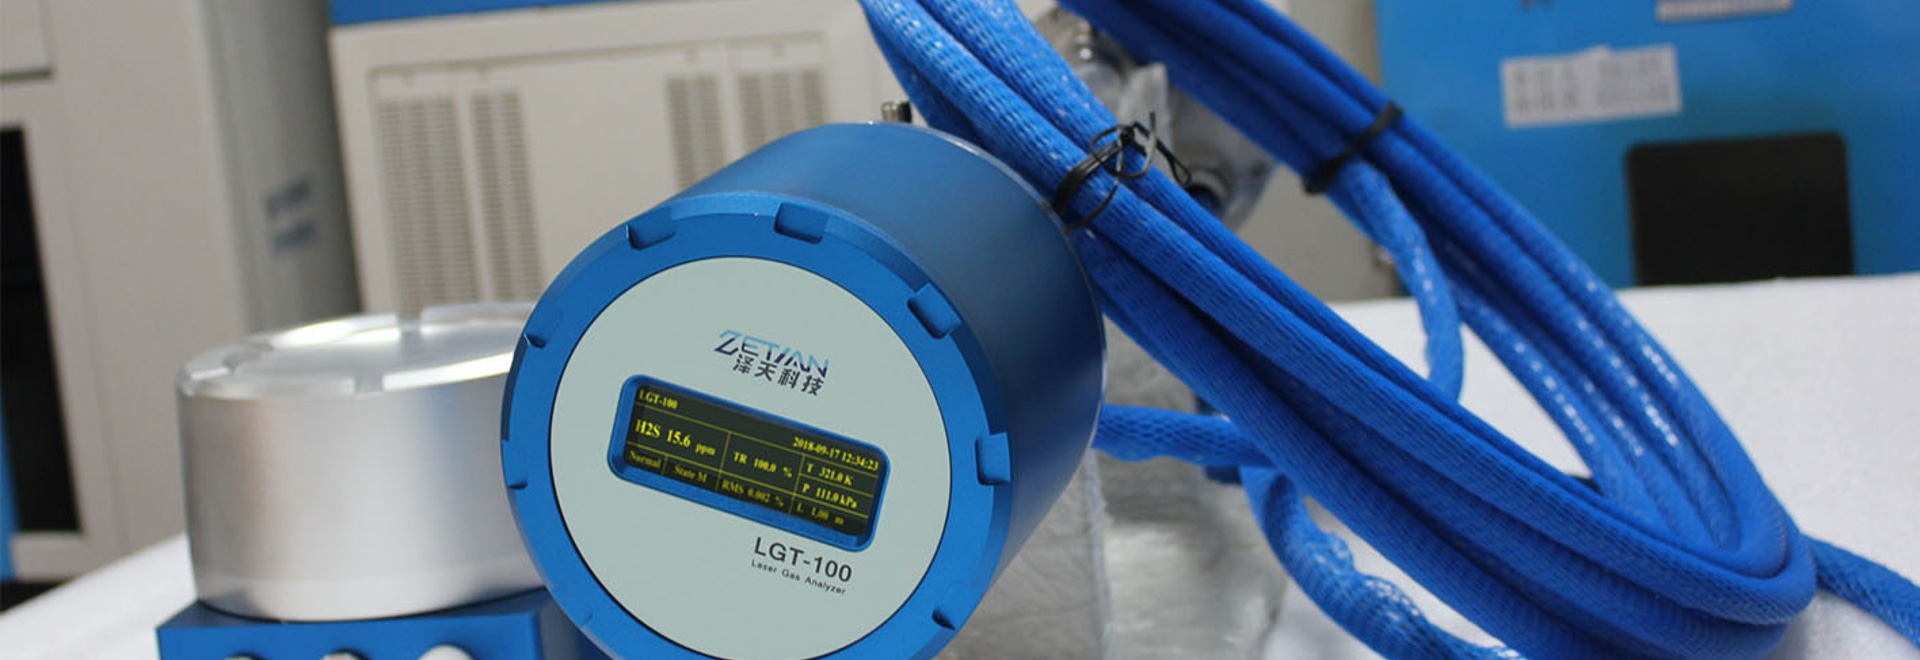 ATEX Certificates for LGT-1000 Laser Gas Analyzer